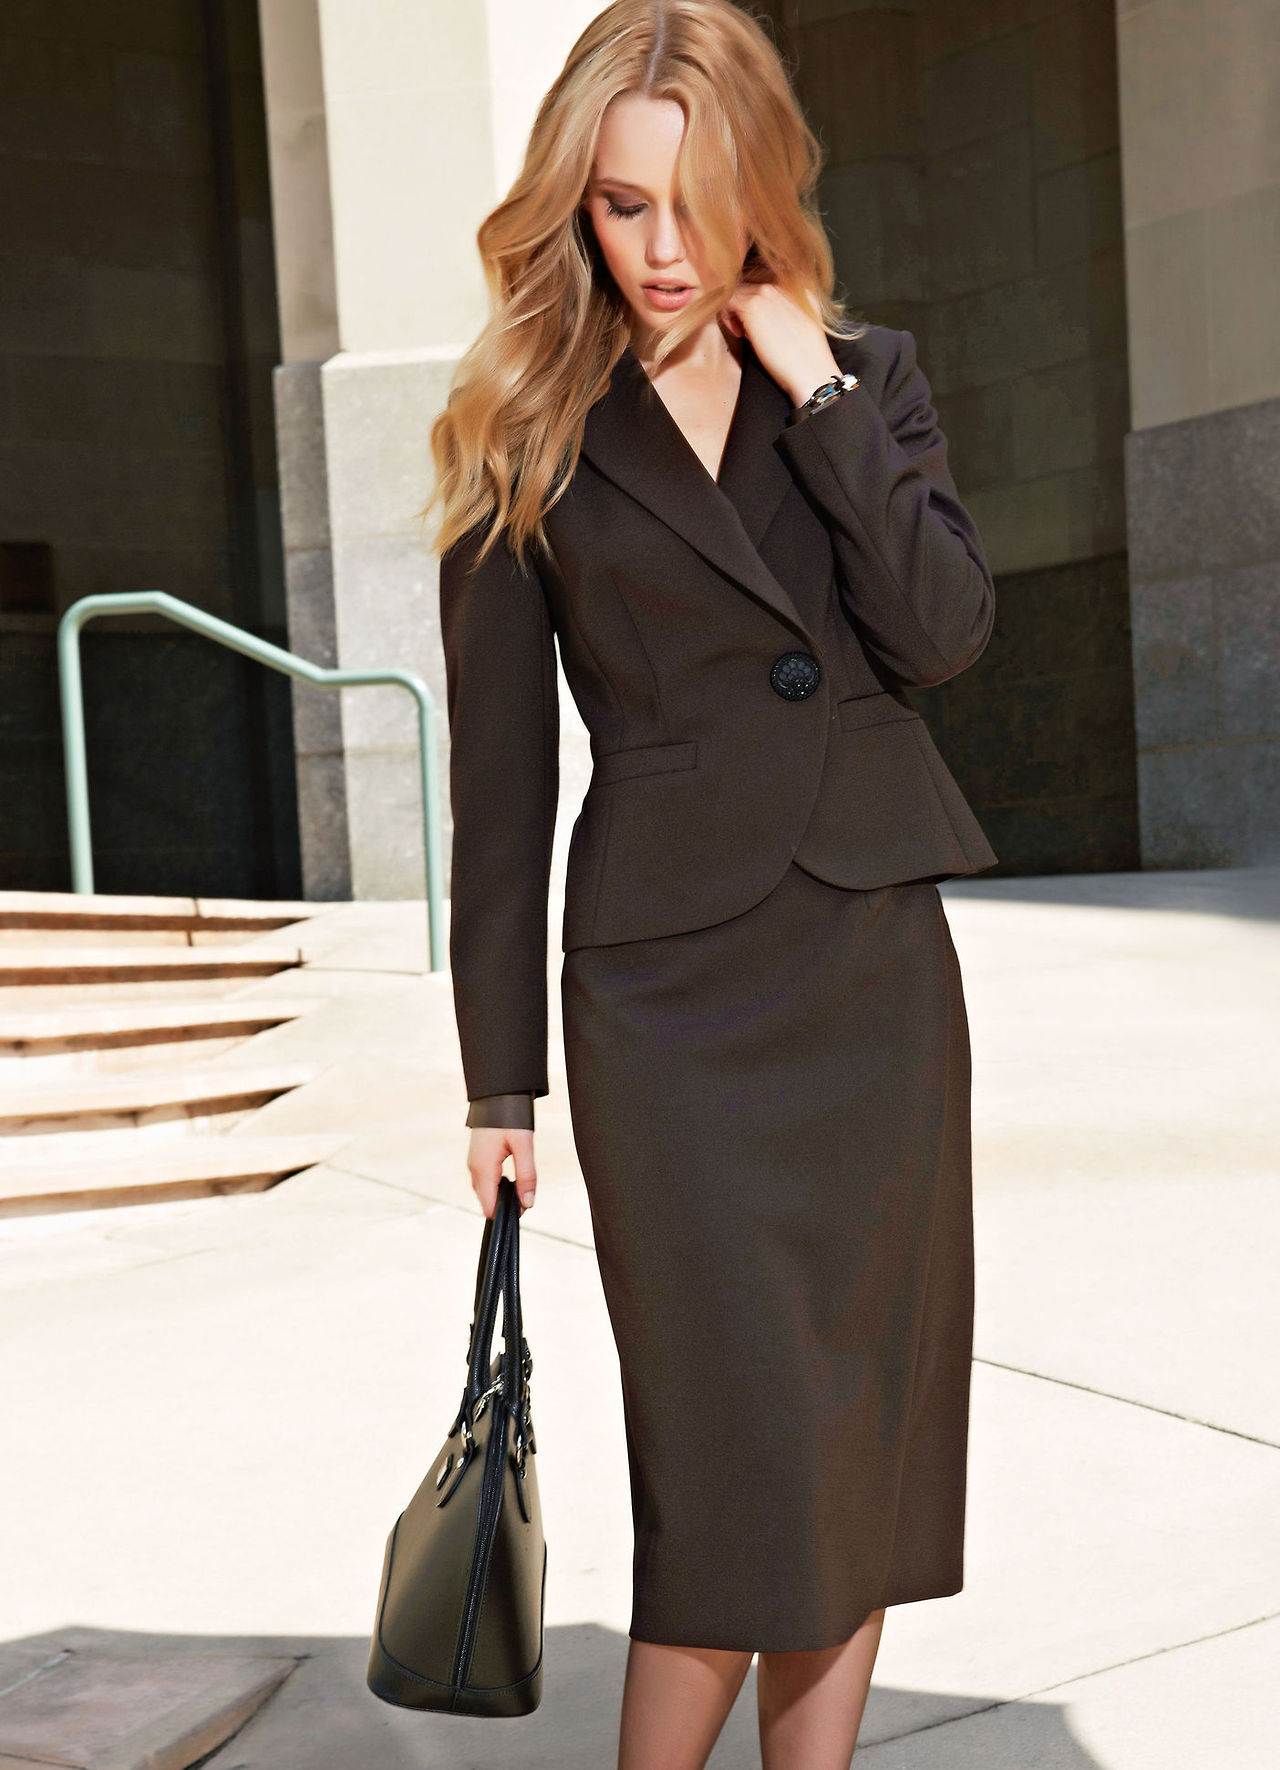 f5c578163638 Τα ντυσίματα για το γραφείο είναι μία επίπονη διαδικασία το πρωί για πολλές  γυναίκες